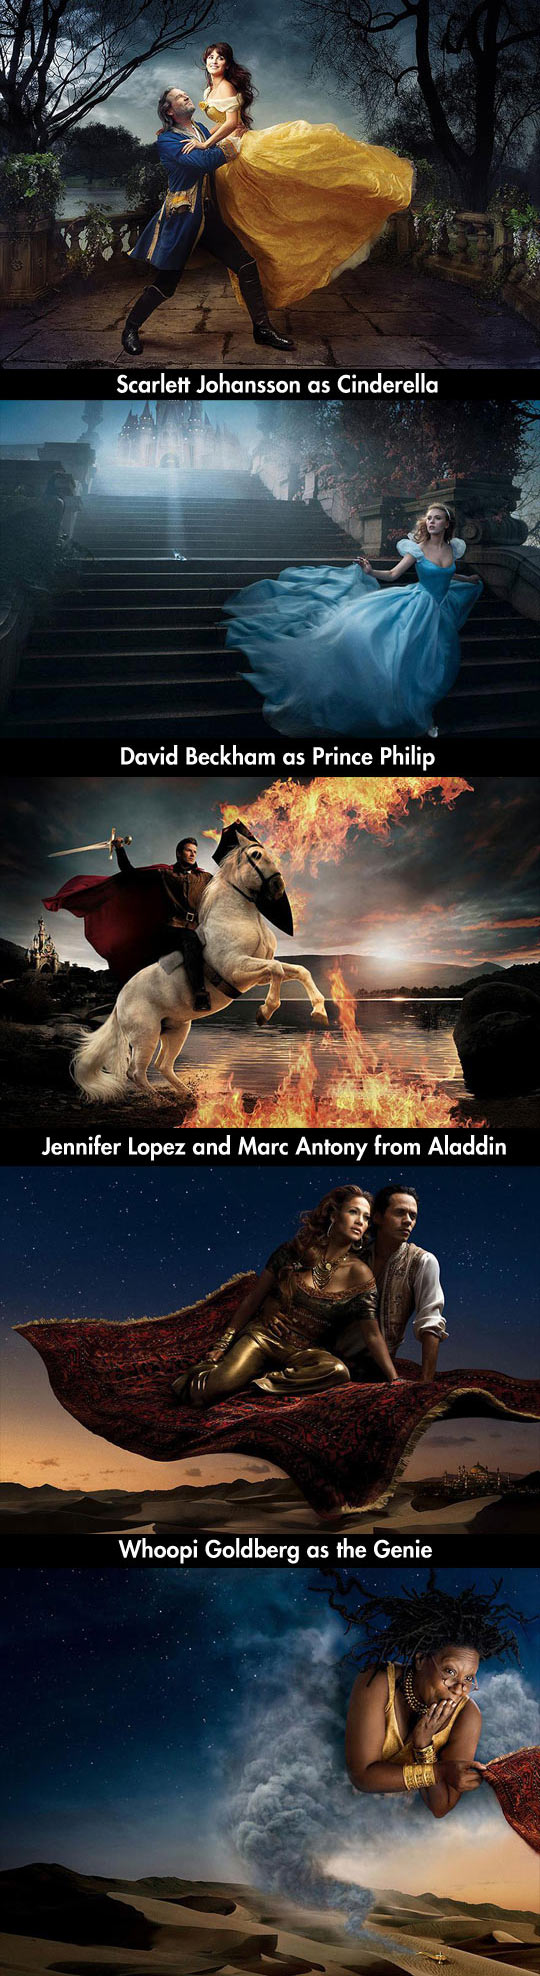 funny-Disney-dream-photo-manipulation-movies-Aladdin